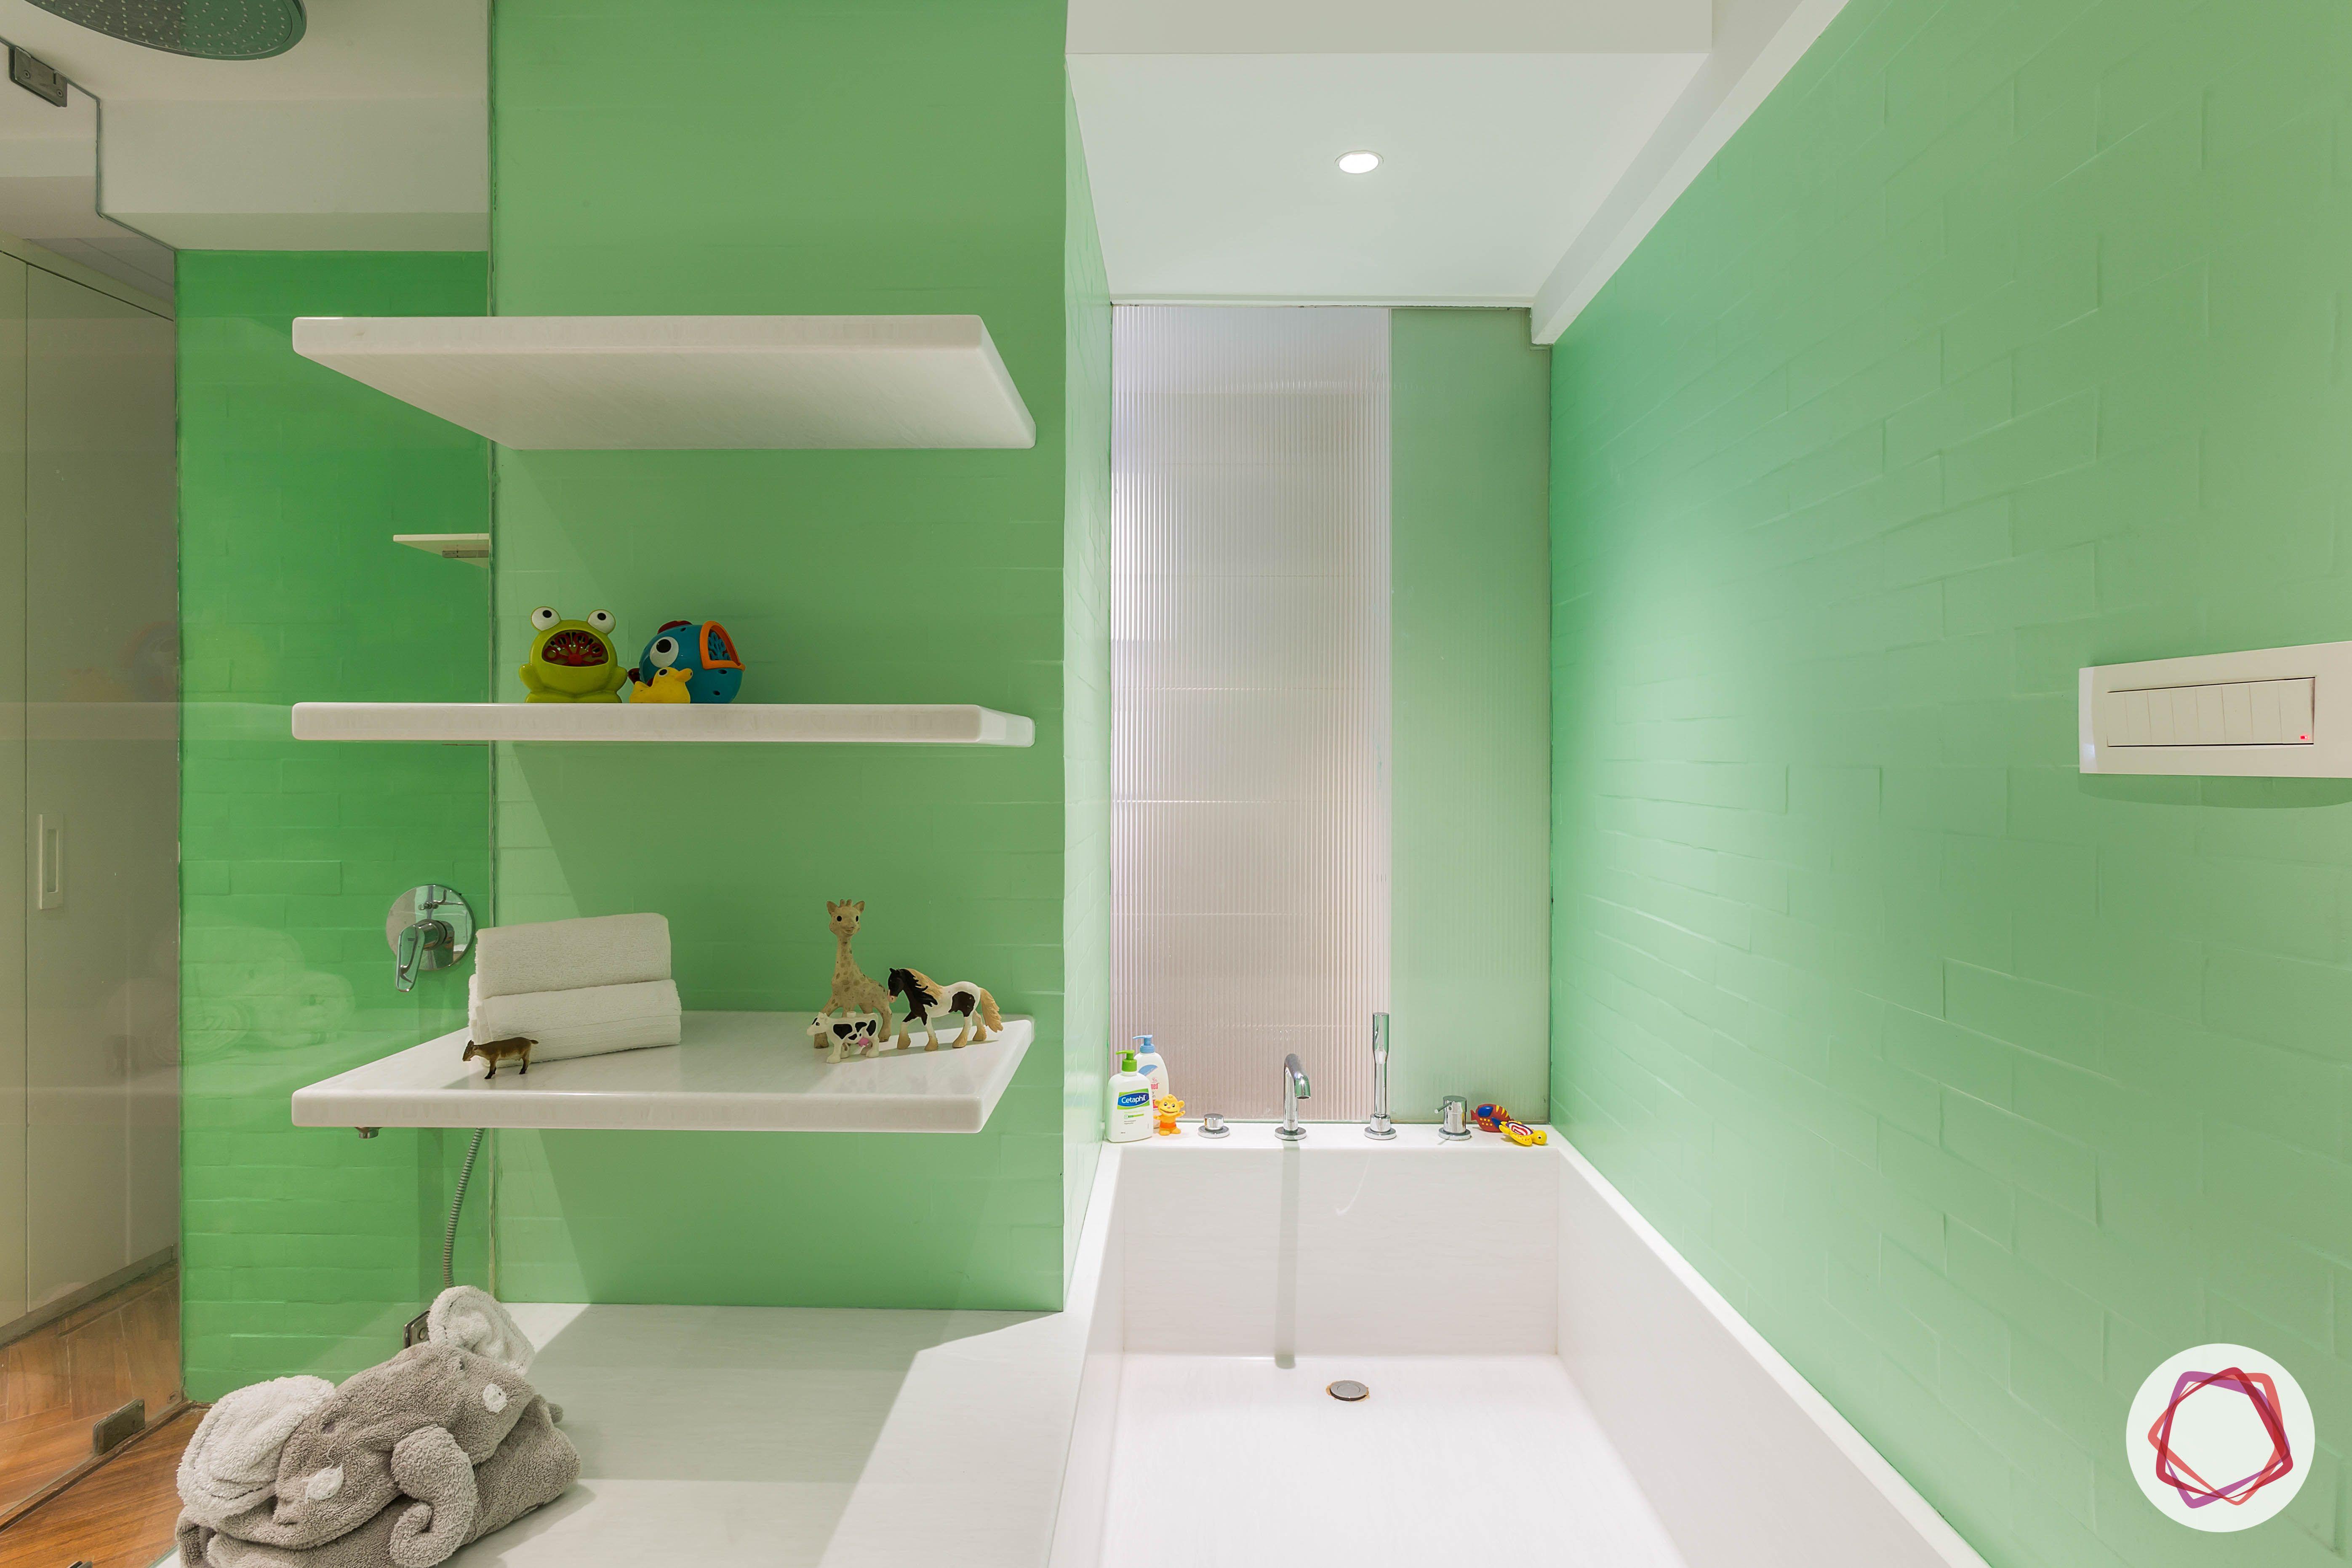 condo-interior-design-green-wall-ideas-white-shelf-designs